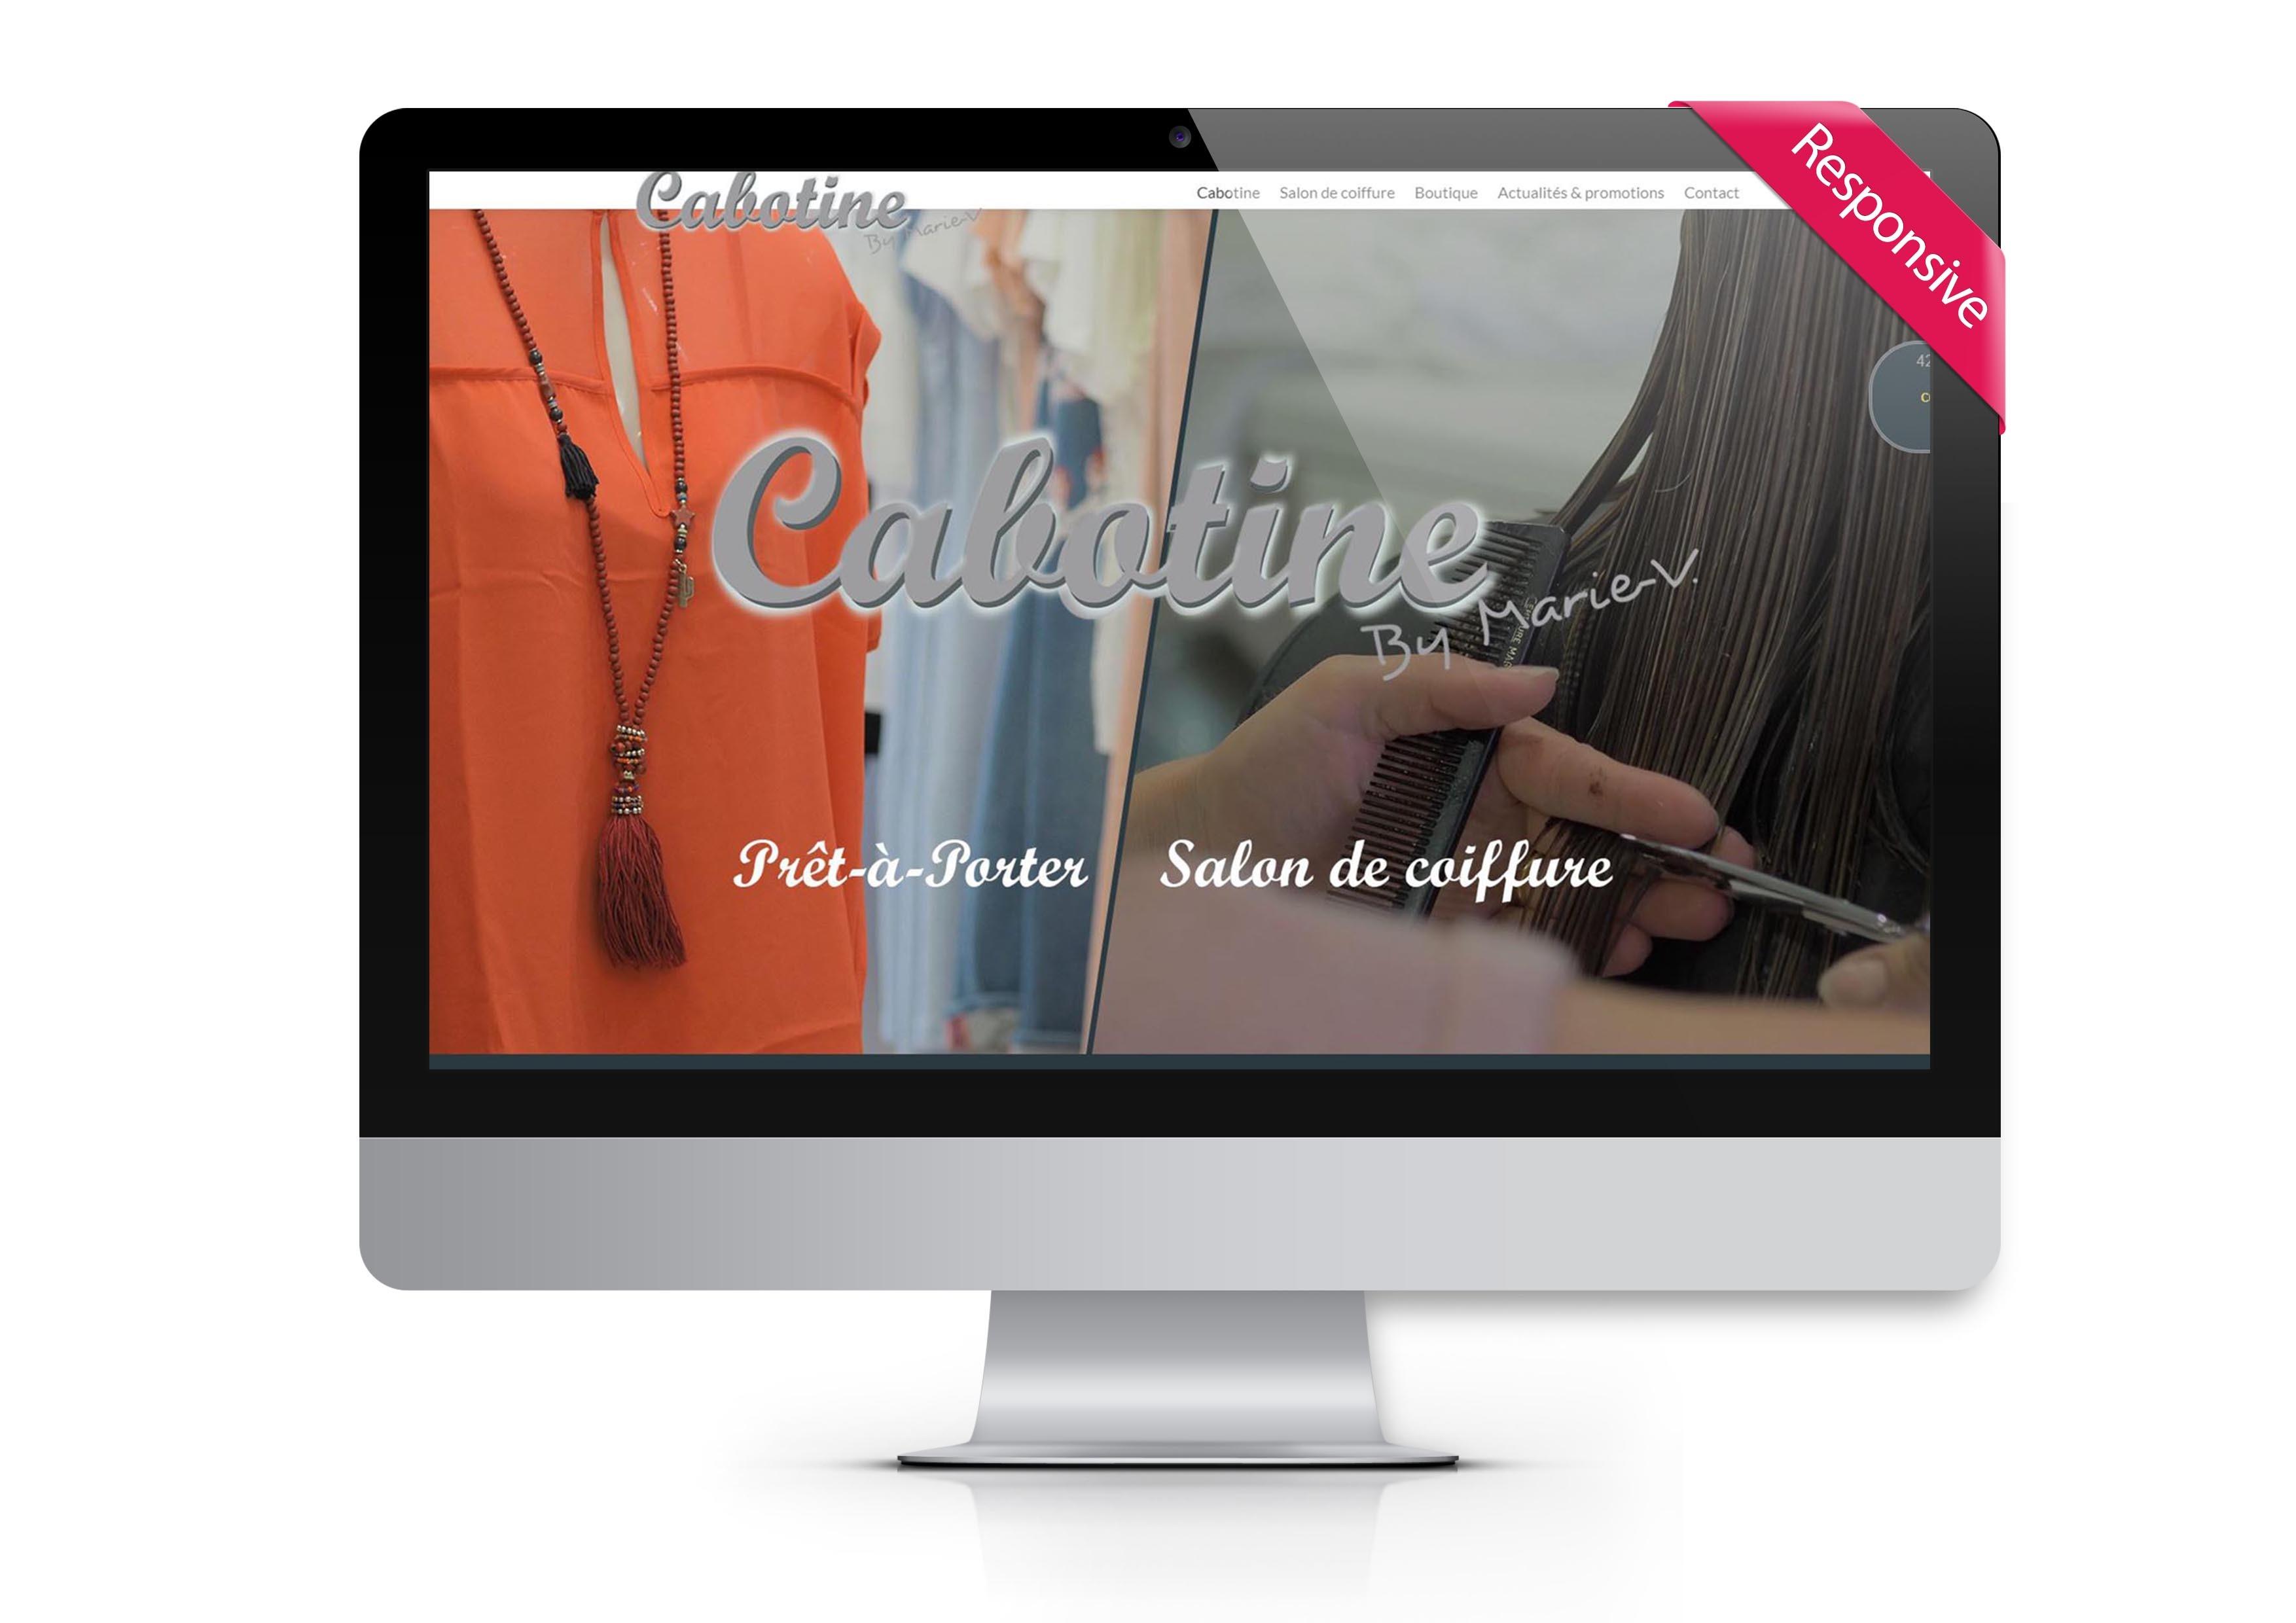 Cabotine